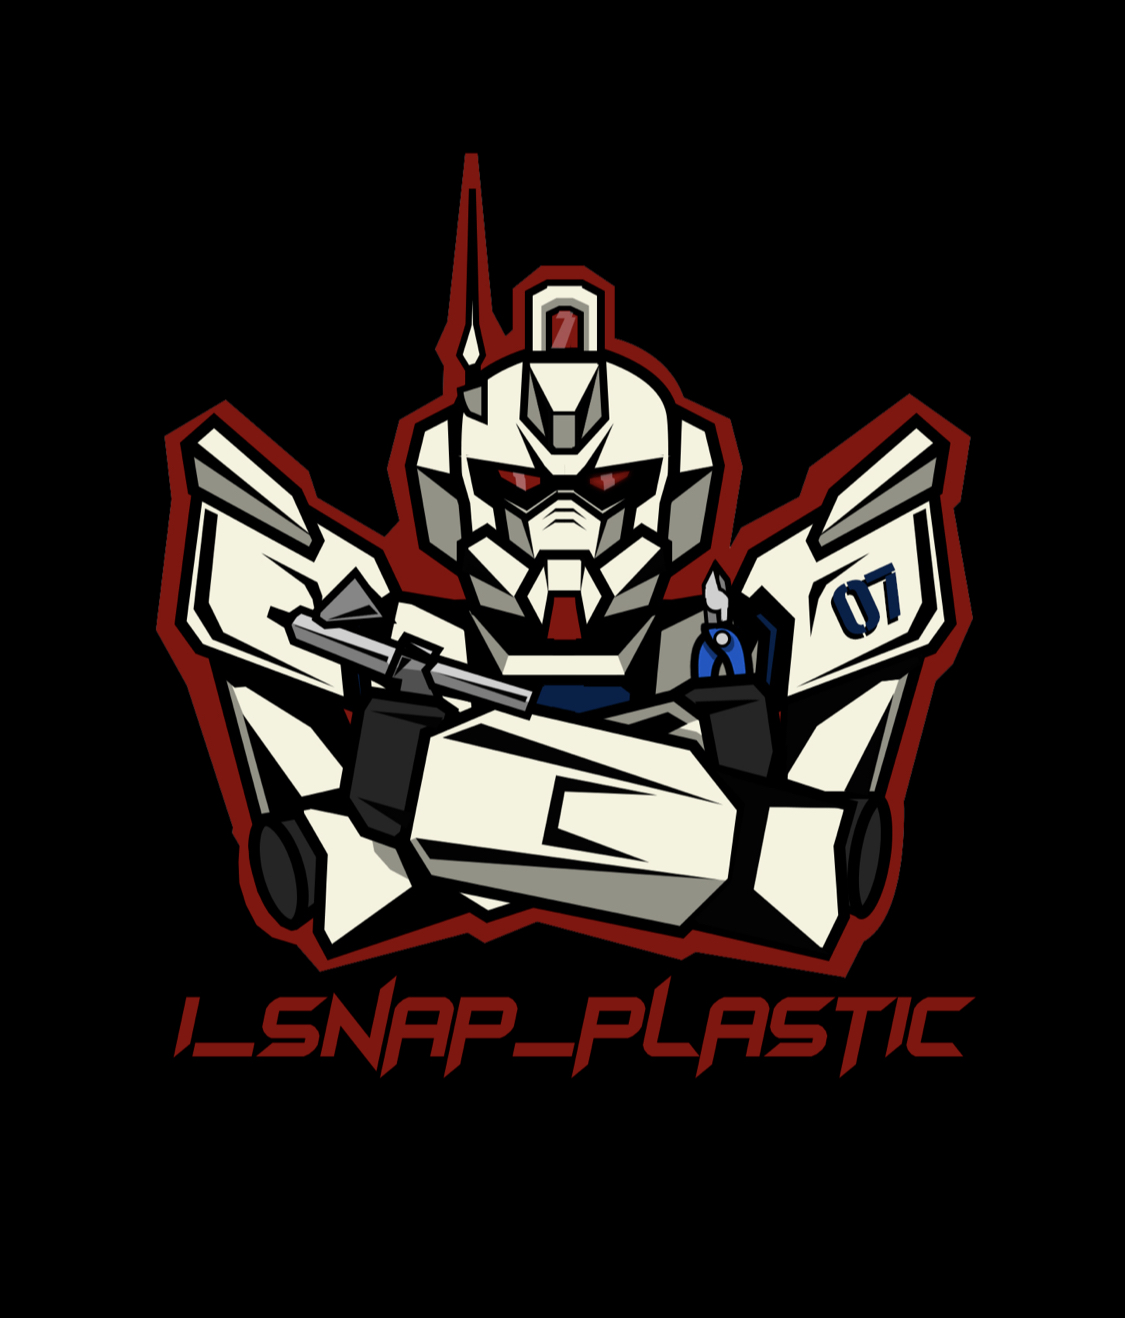 @I_Snap_Plastic profile image